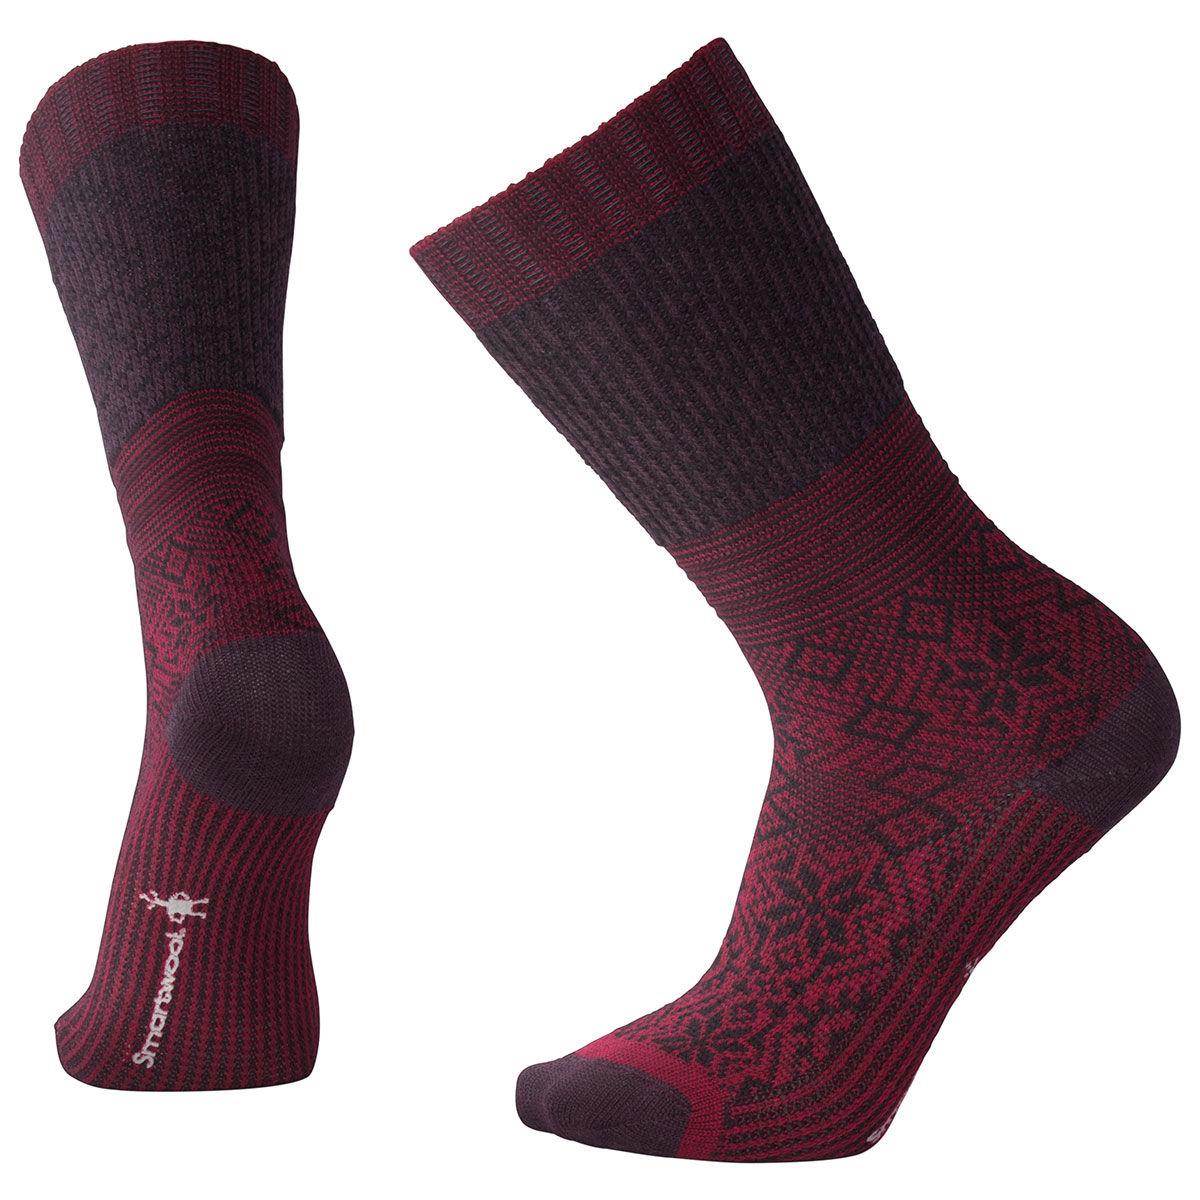 Smartwool Snowflake Flurry Socks - Red, S